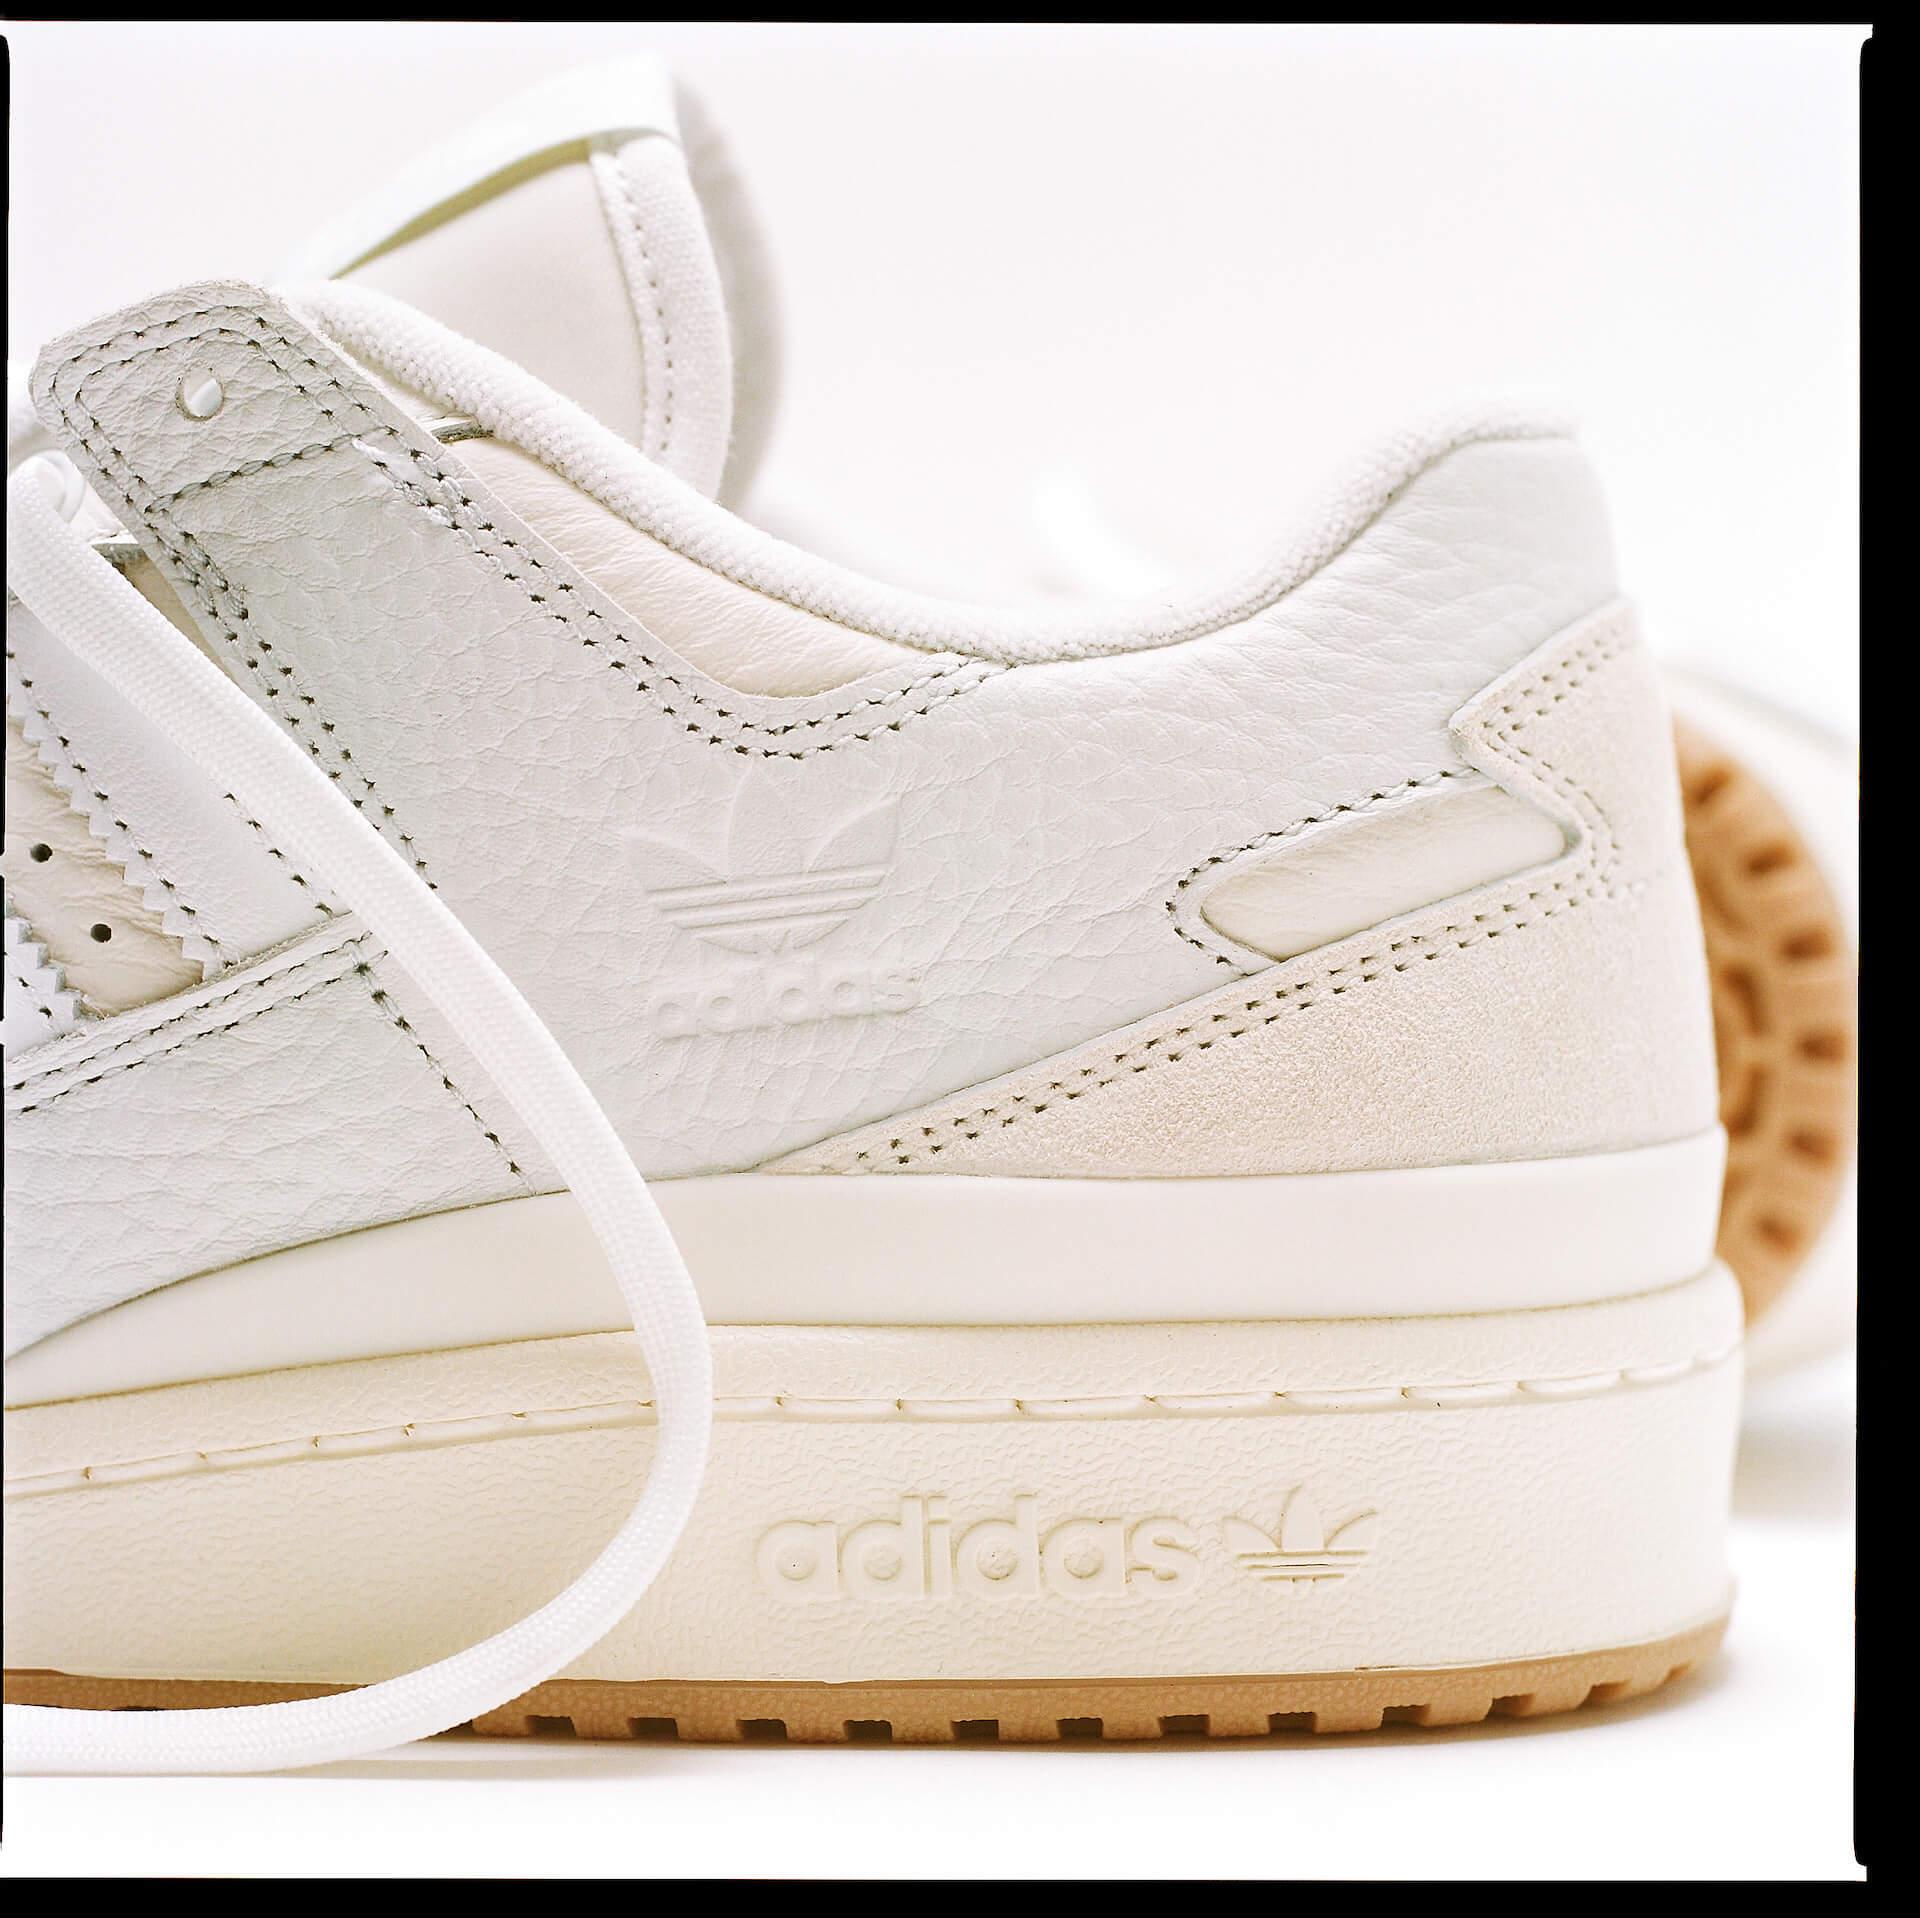 adidas Skateboarding「FORUM 84 ADV」に春夏仕様の新色が登場!チョークホワイト&ブラックの2色 life210324_adidasskateboarding_6